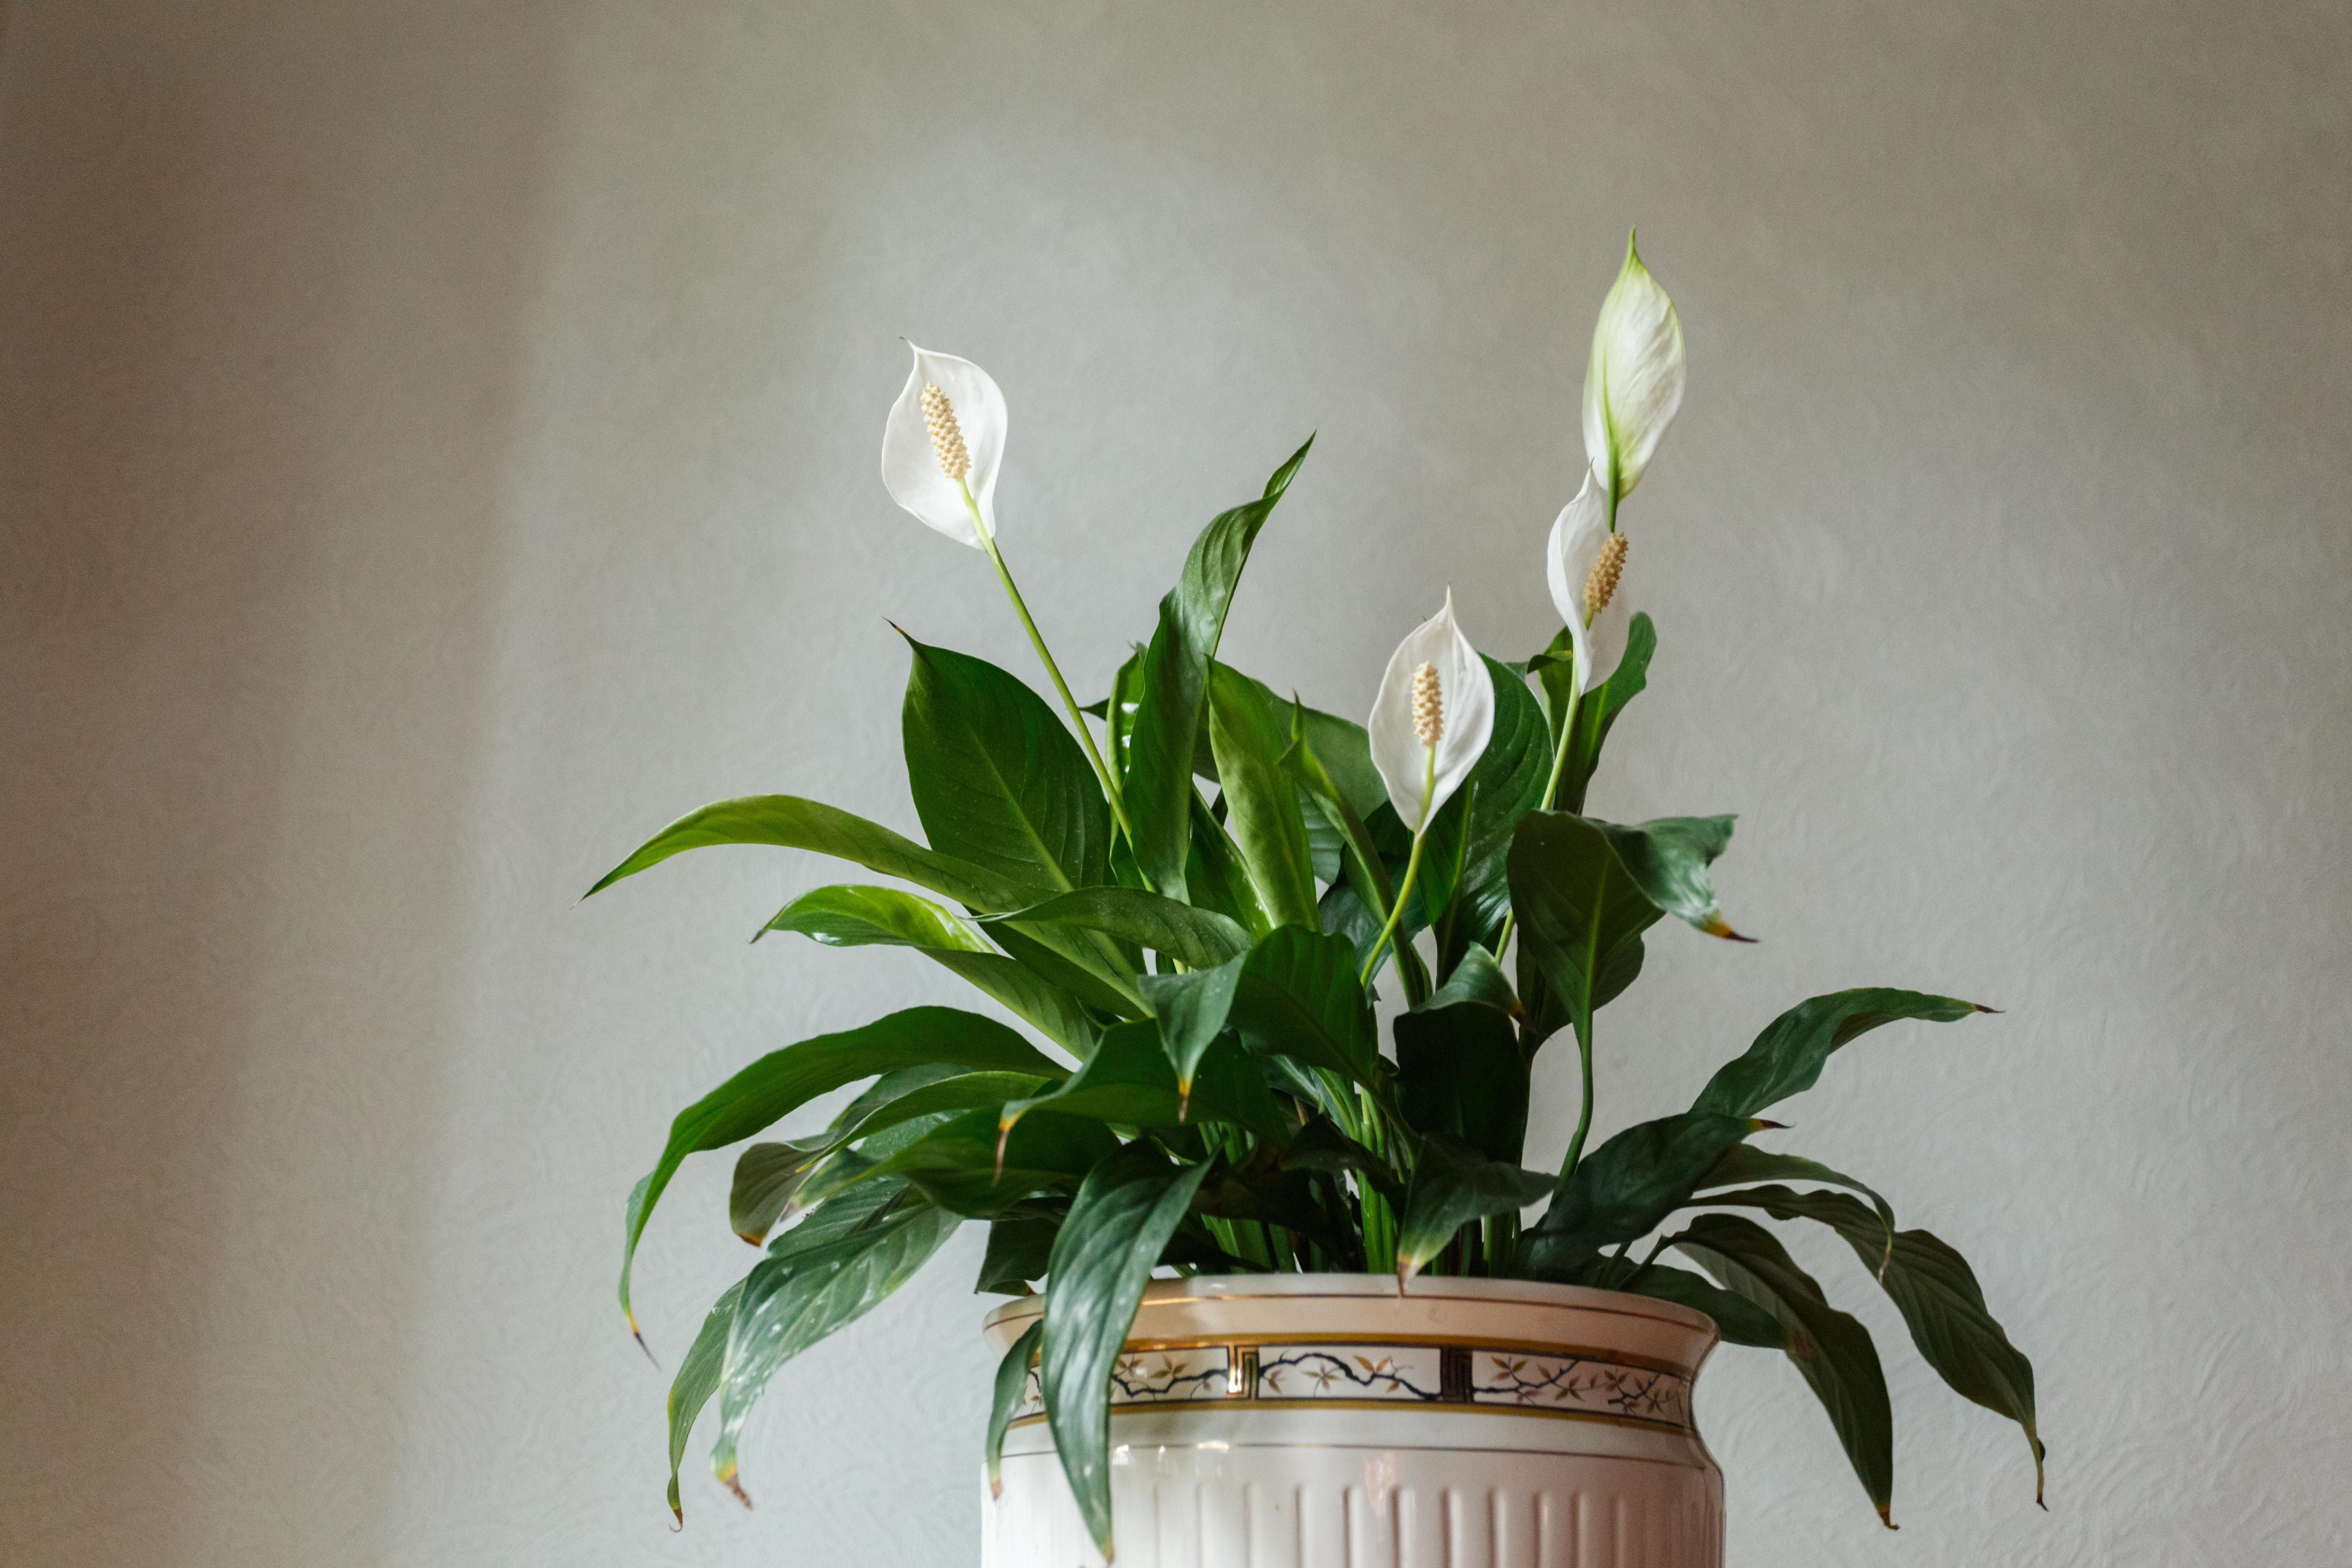 spathiphyllum growers Sorrento